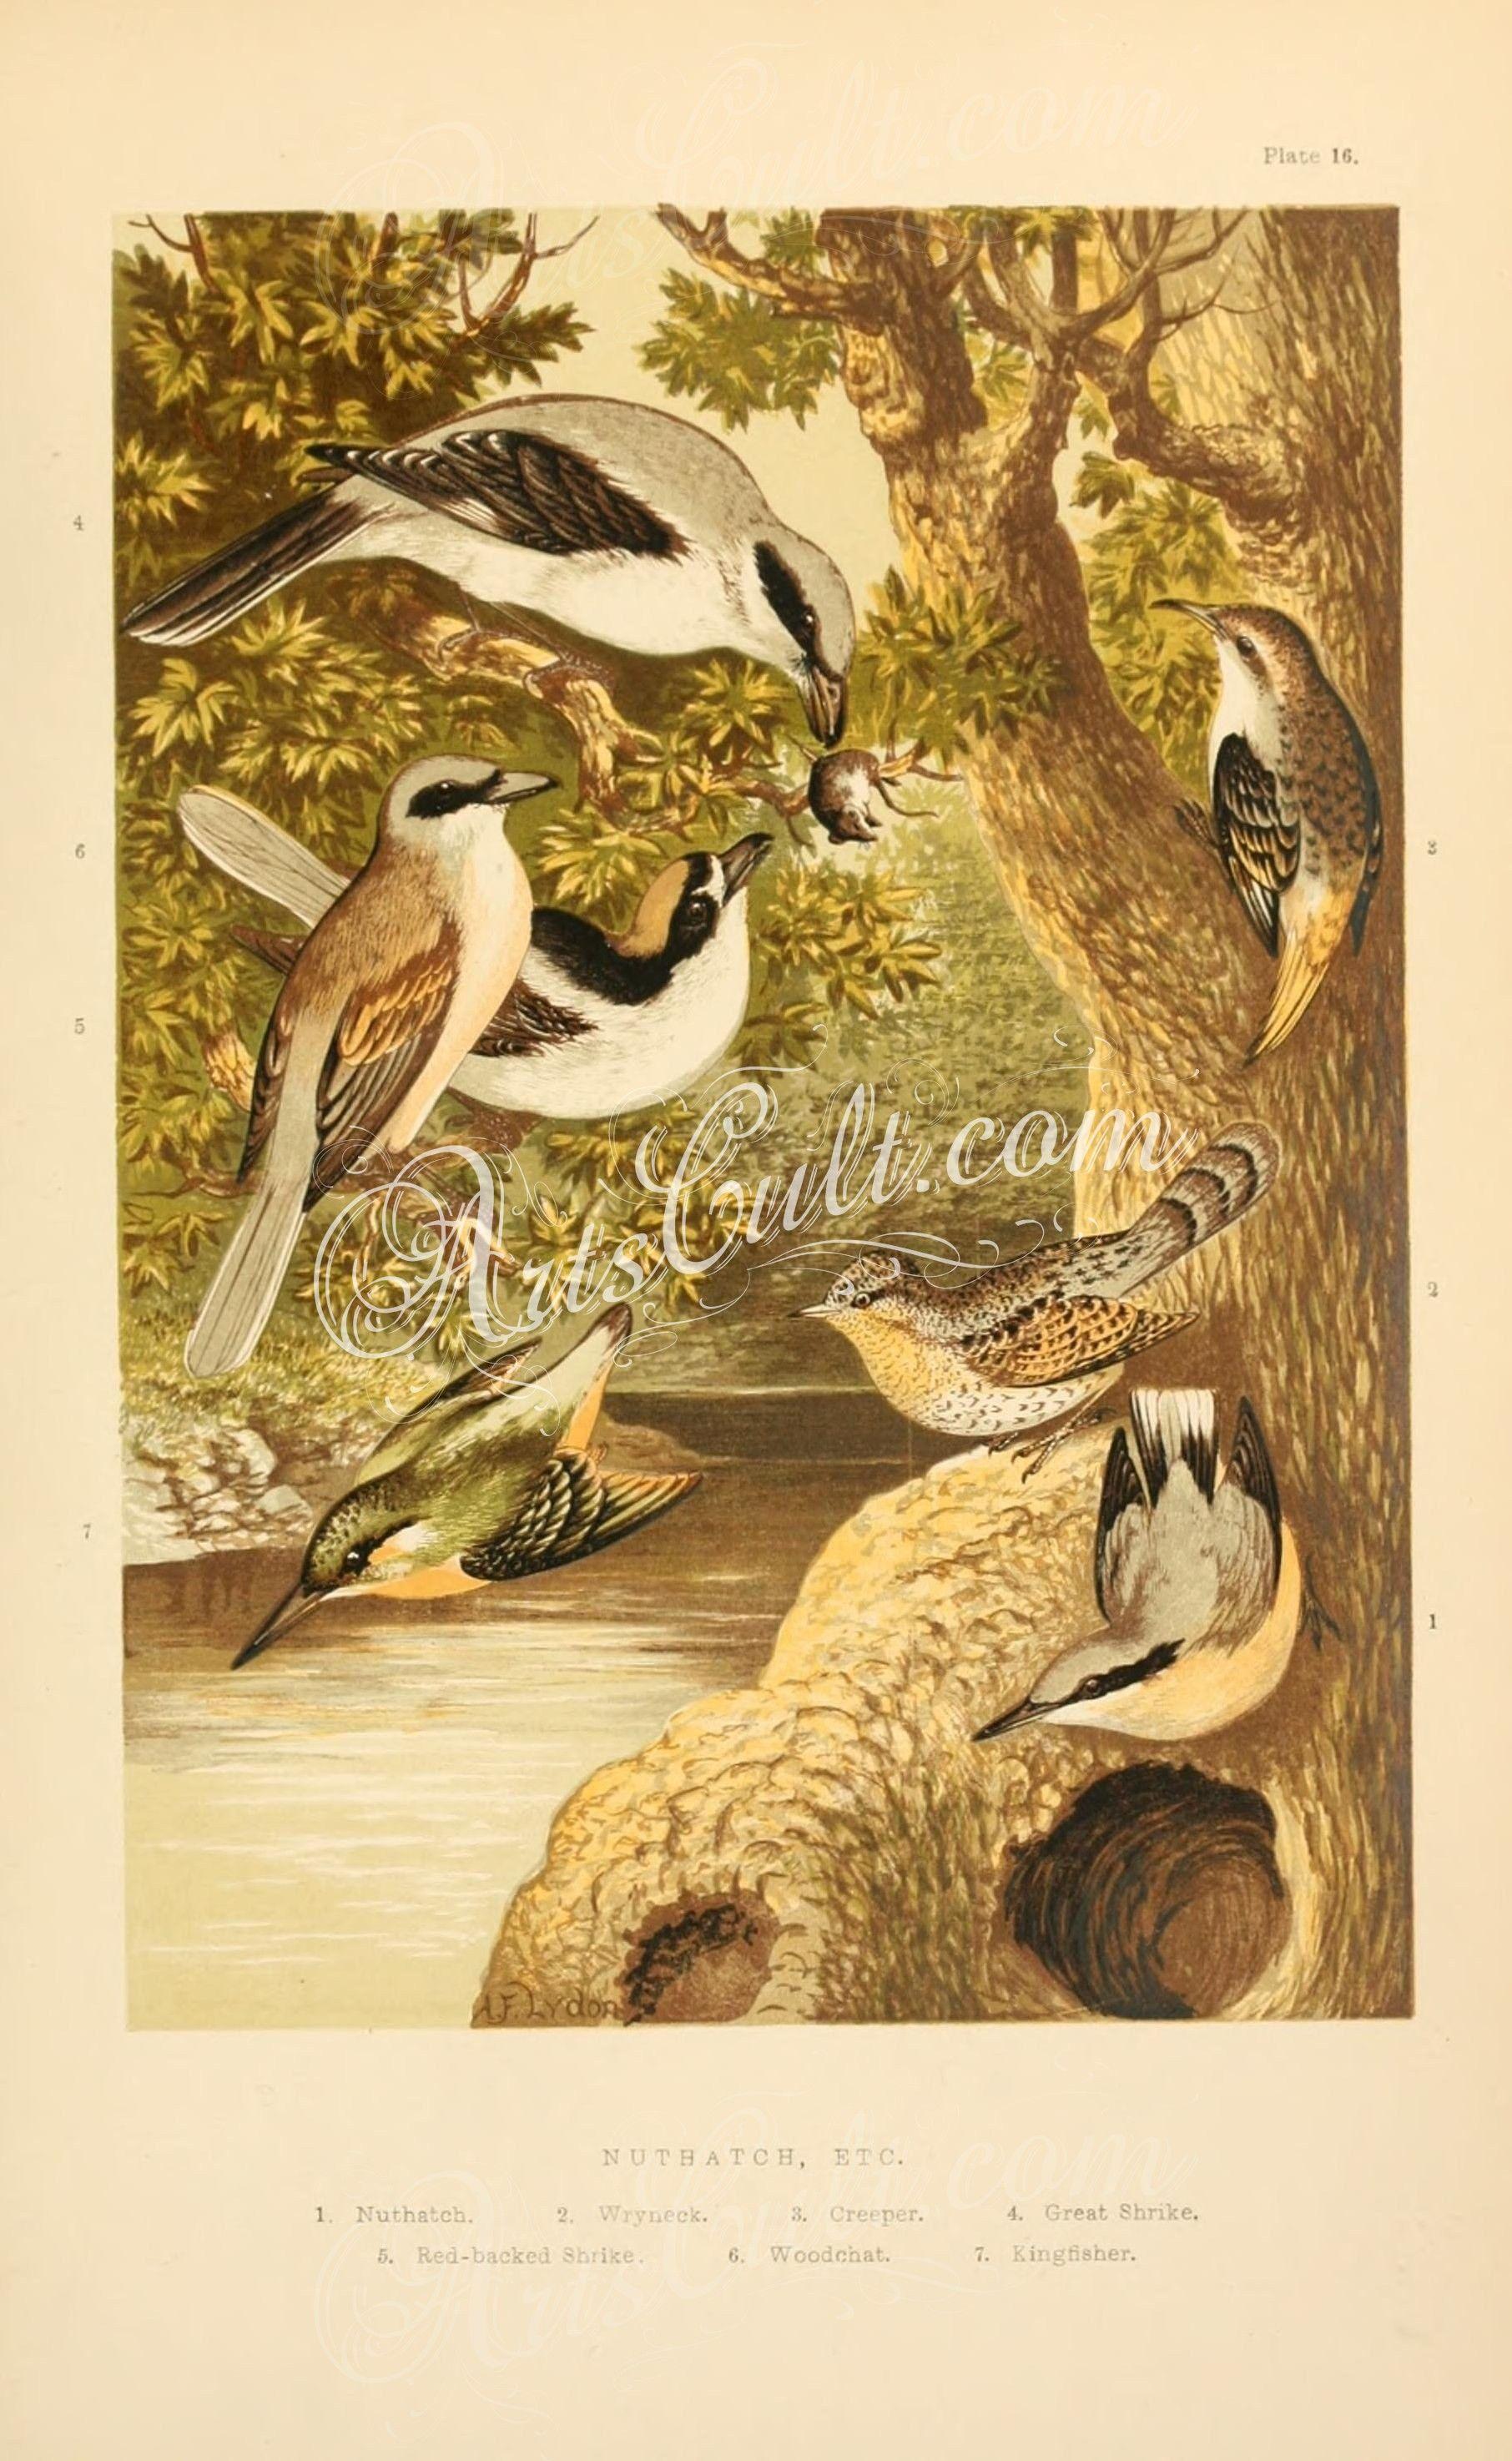 birds-23886 Nuthatch, Wryneck, Creeper, Great Shrike, Red-backed ...